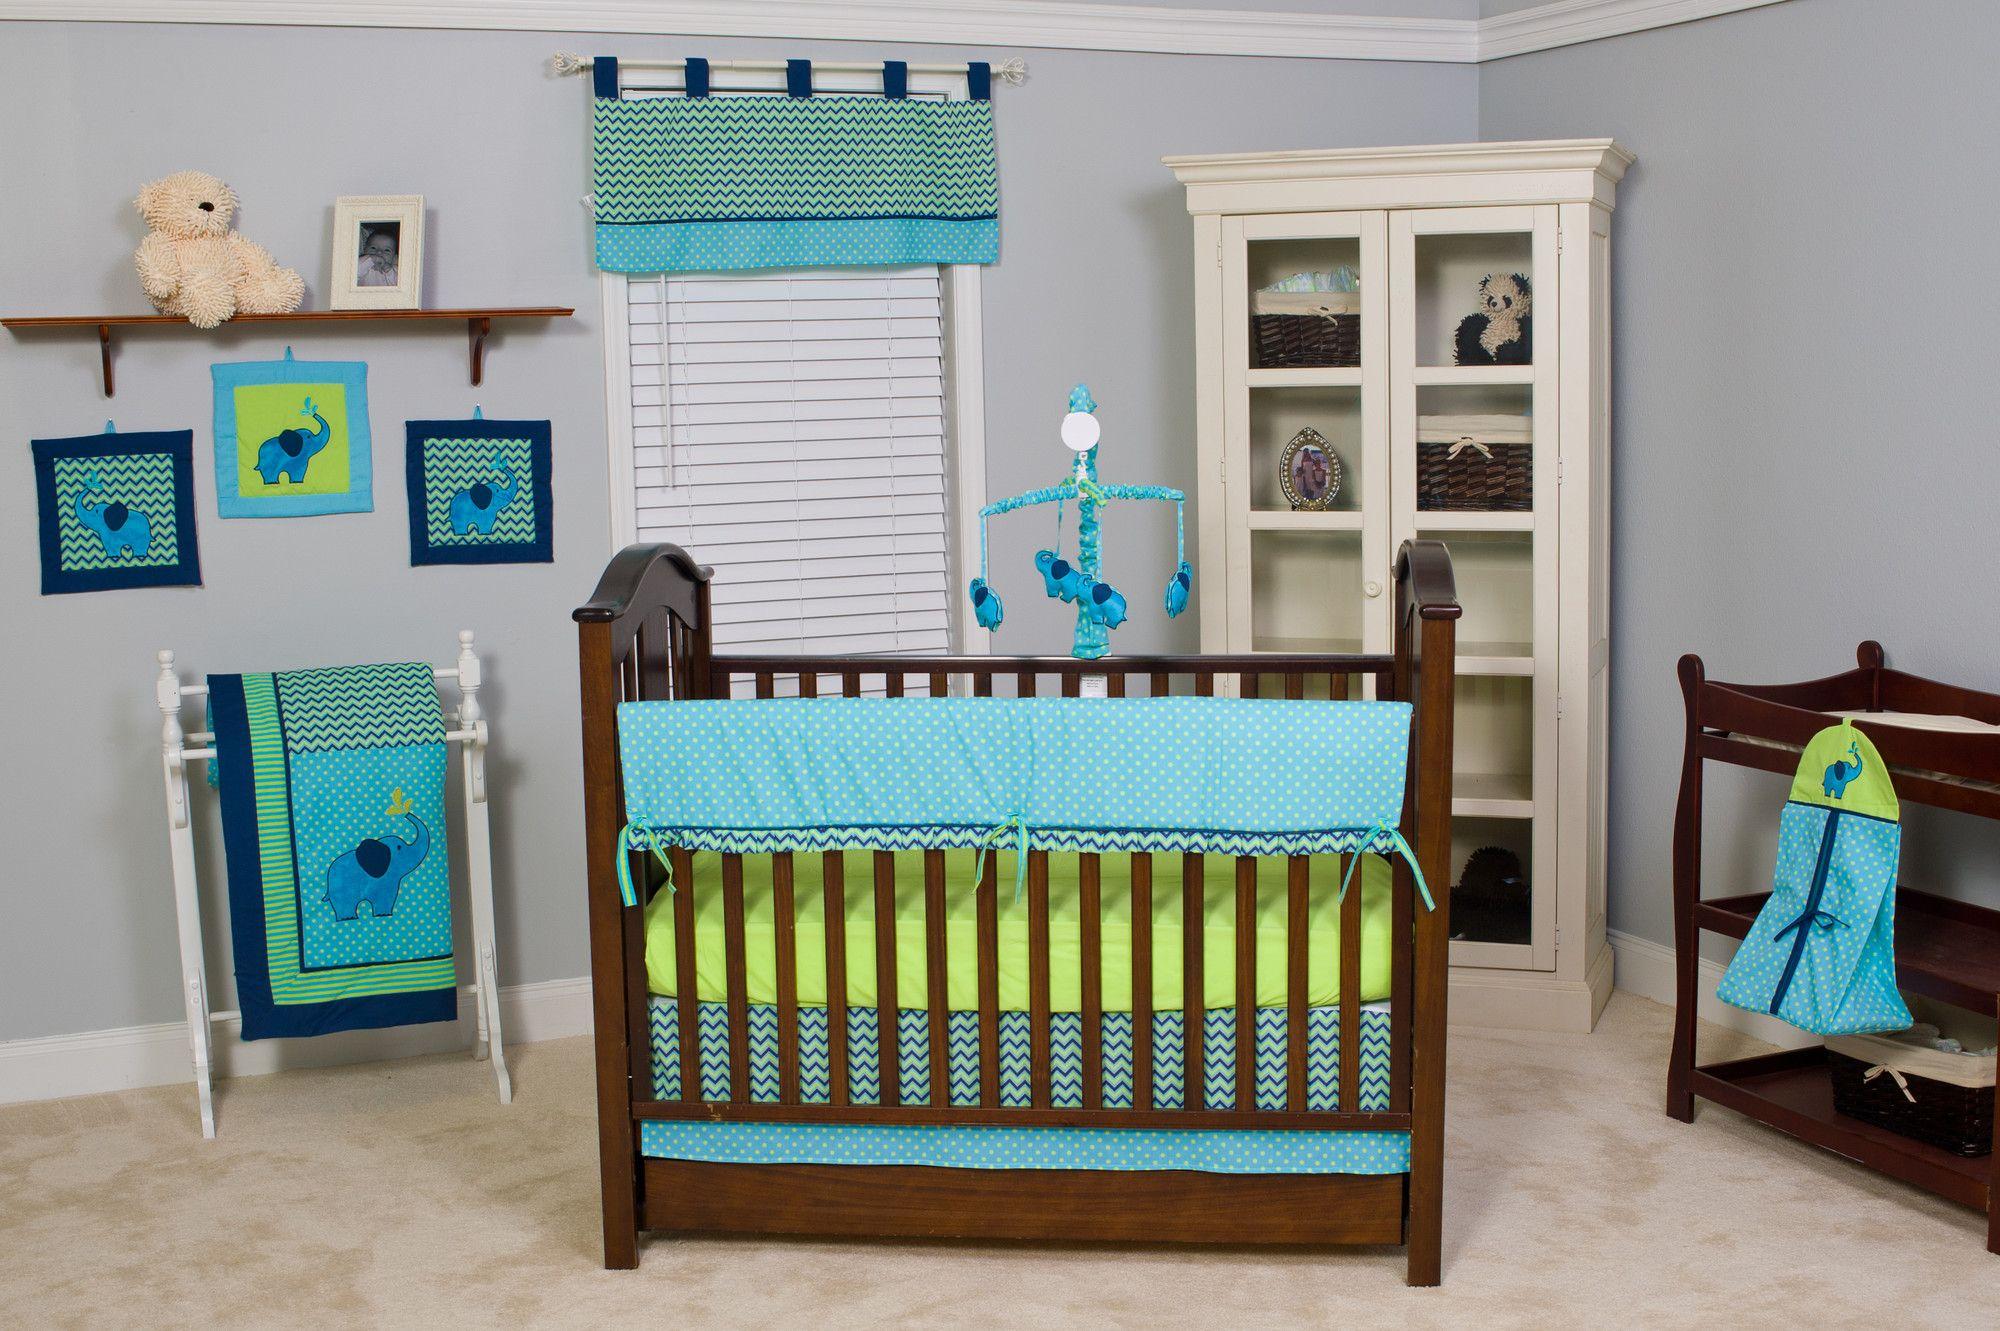 Pam Grace Creations ZigZag 10 Piece Crib Bedding Set & Reviews | Wayfair